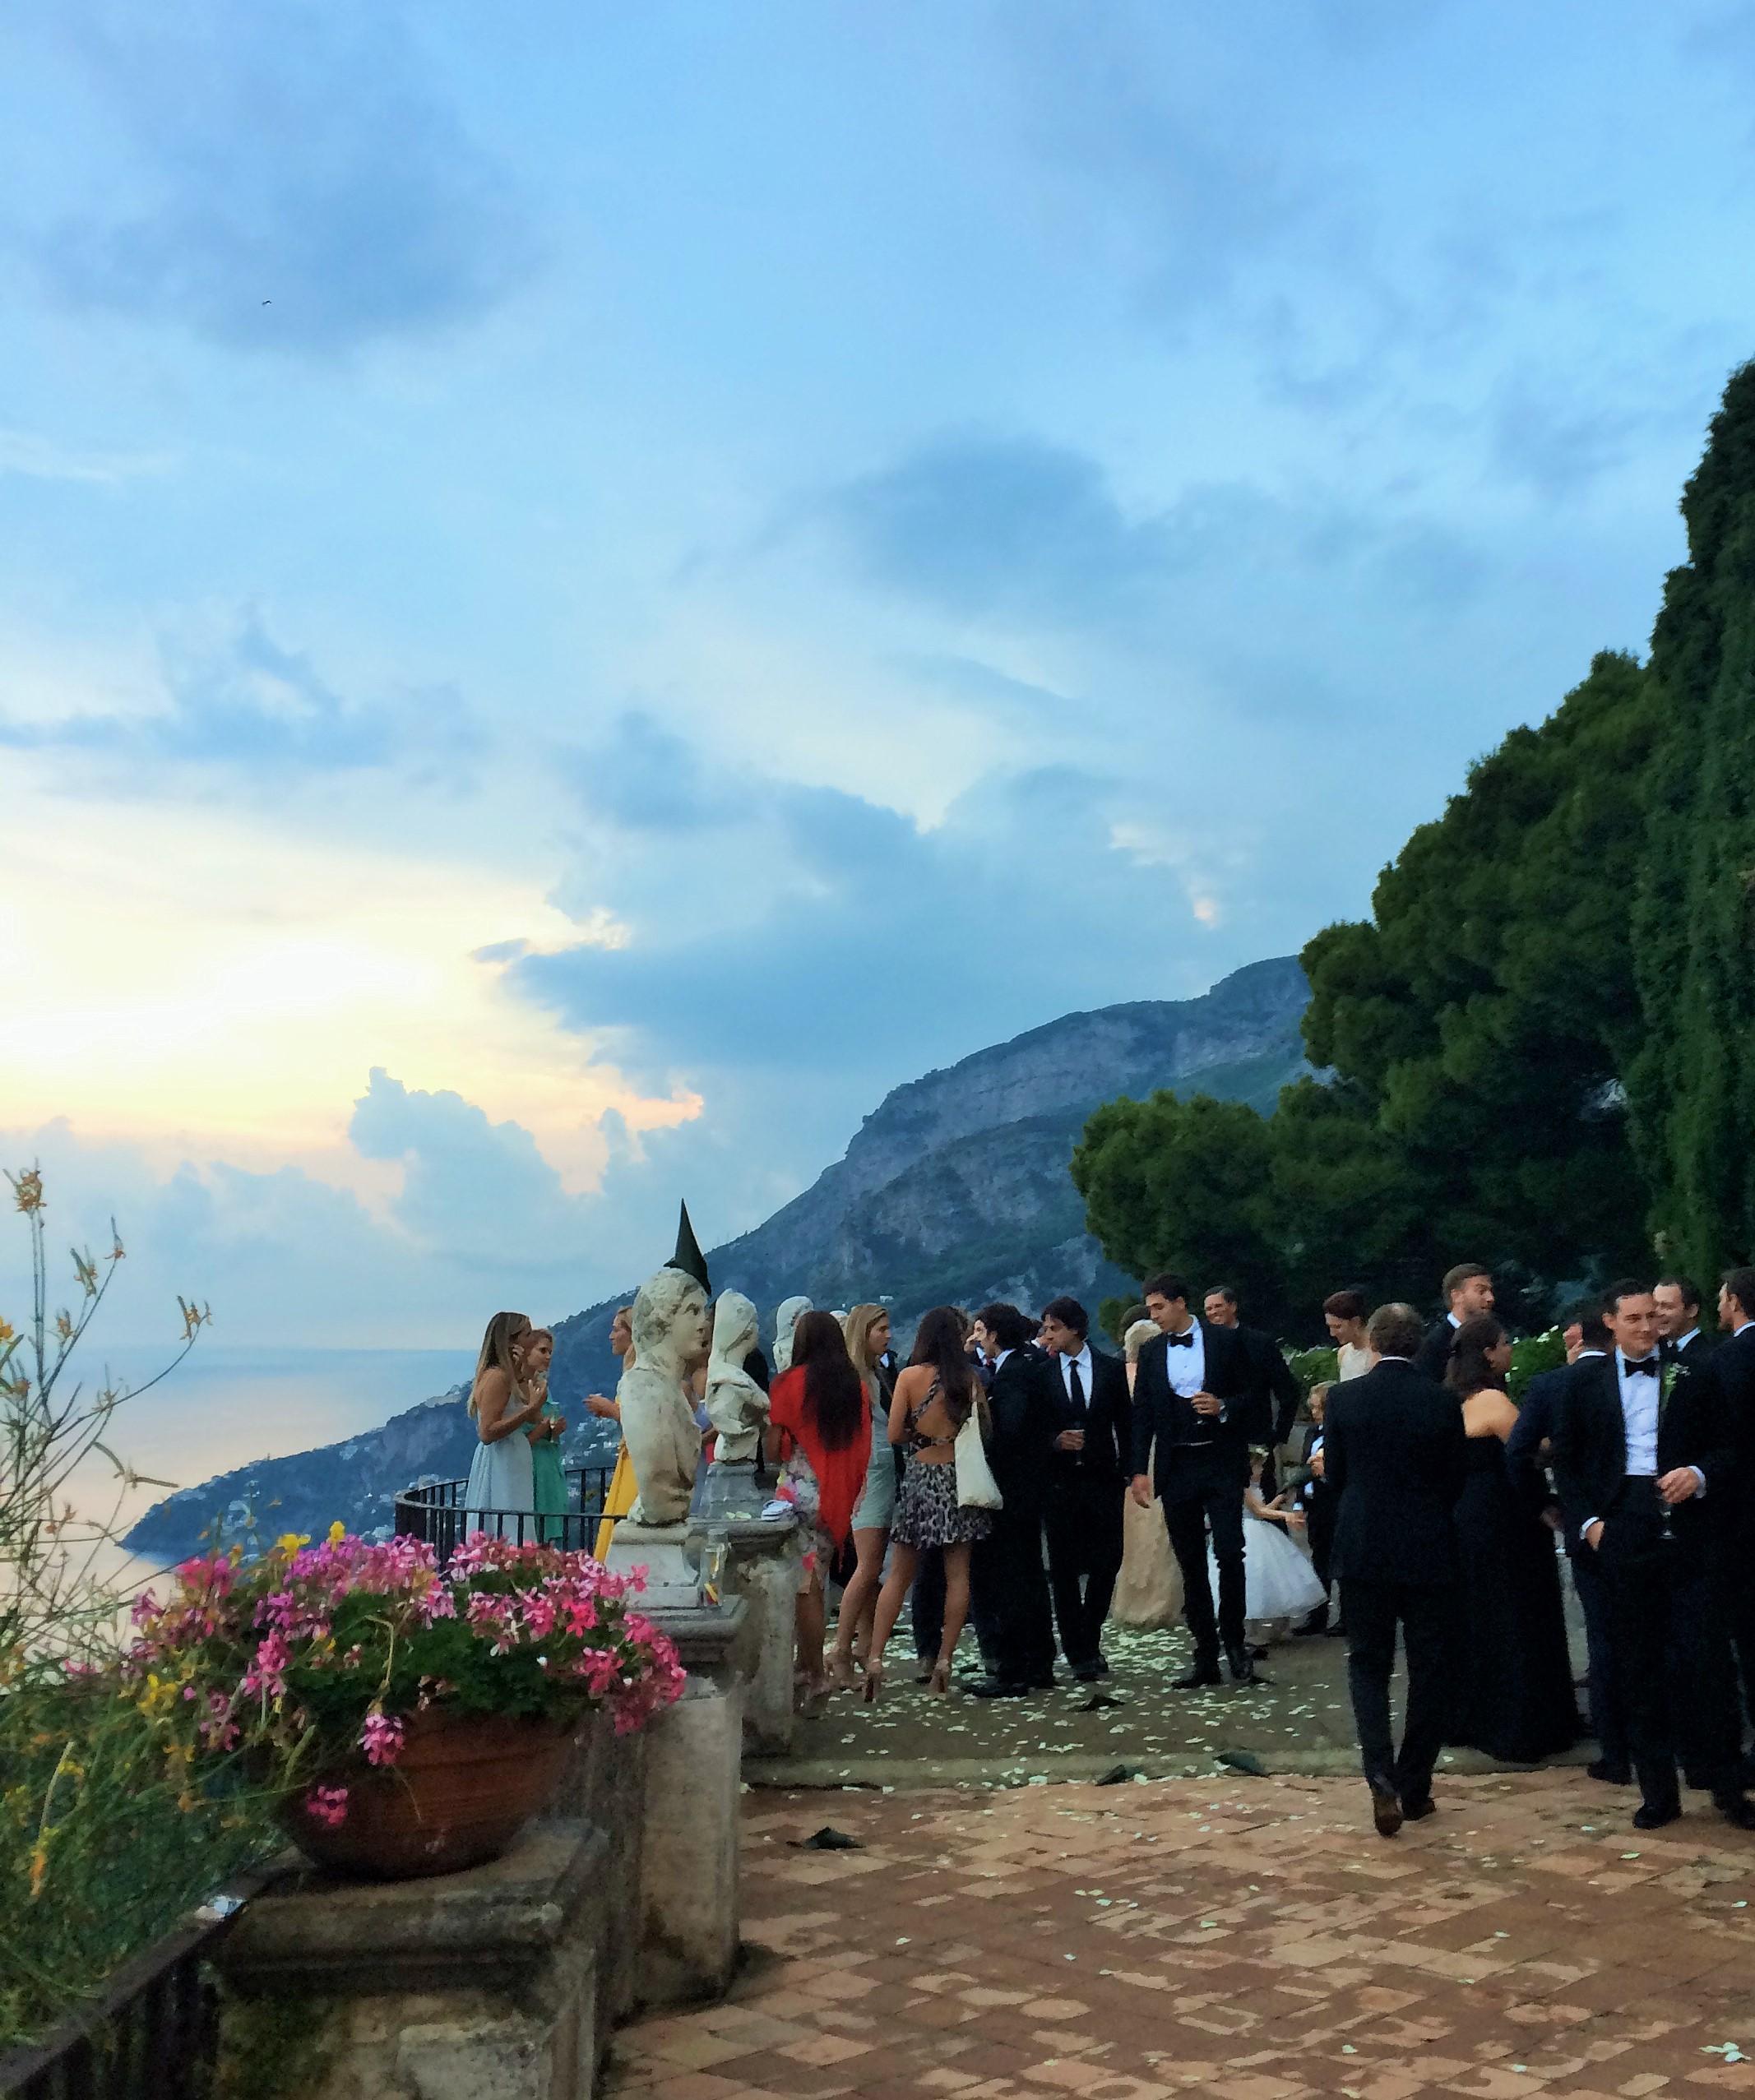 Amalfi_Coast_Wedding_12.JPG